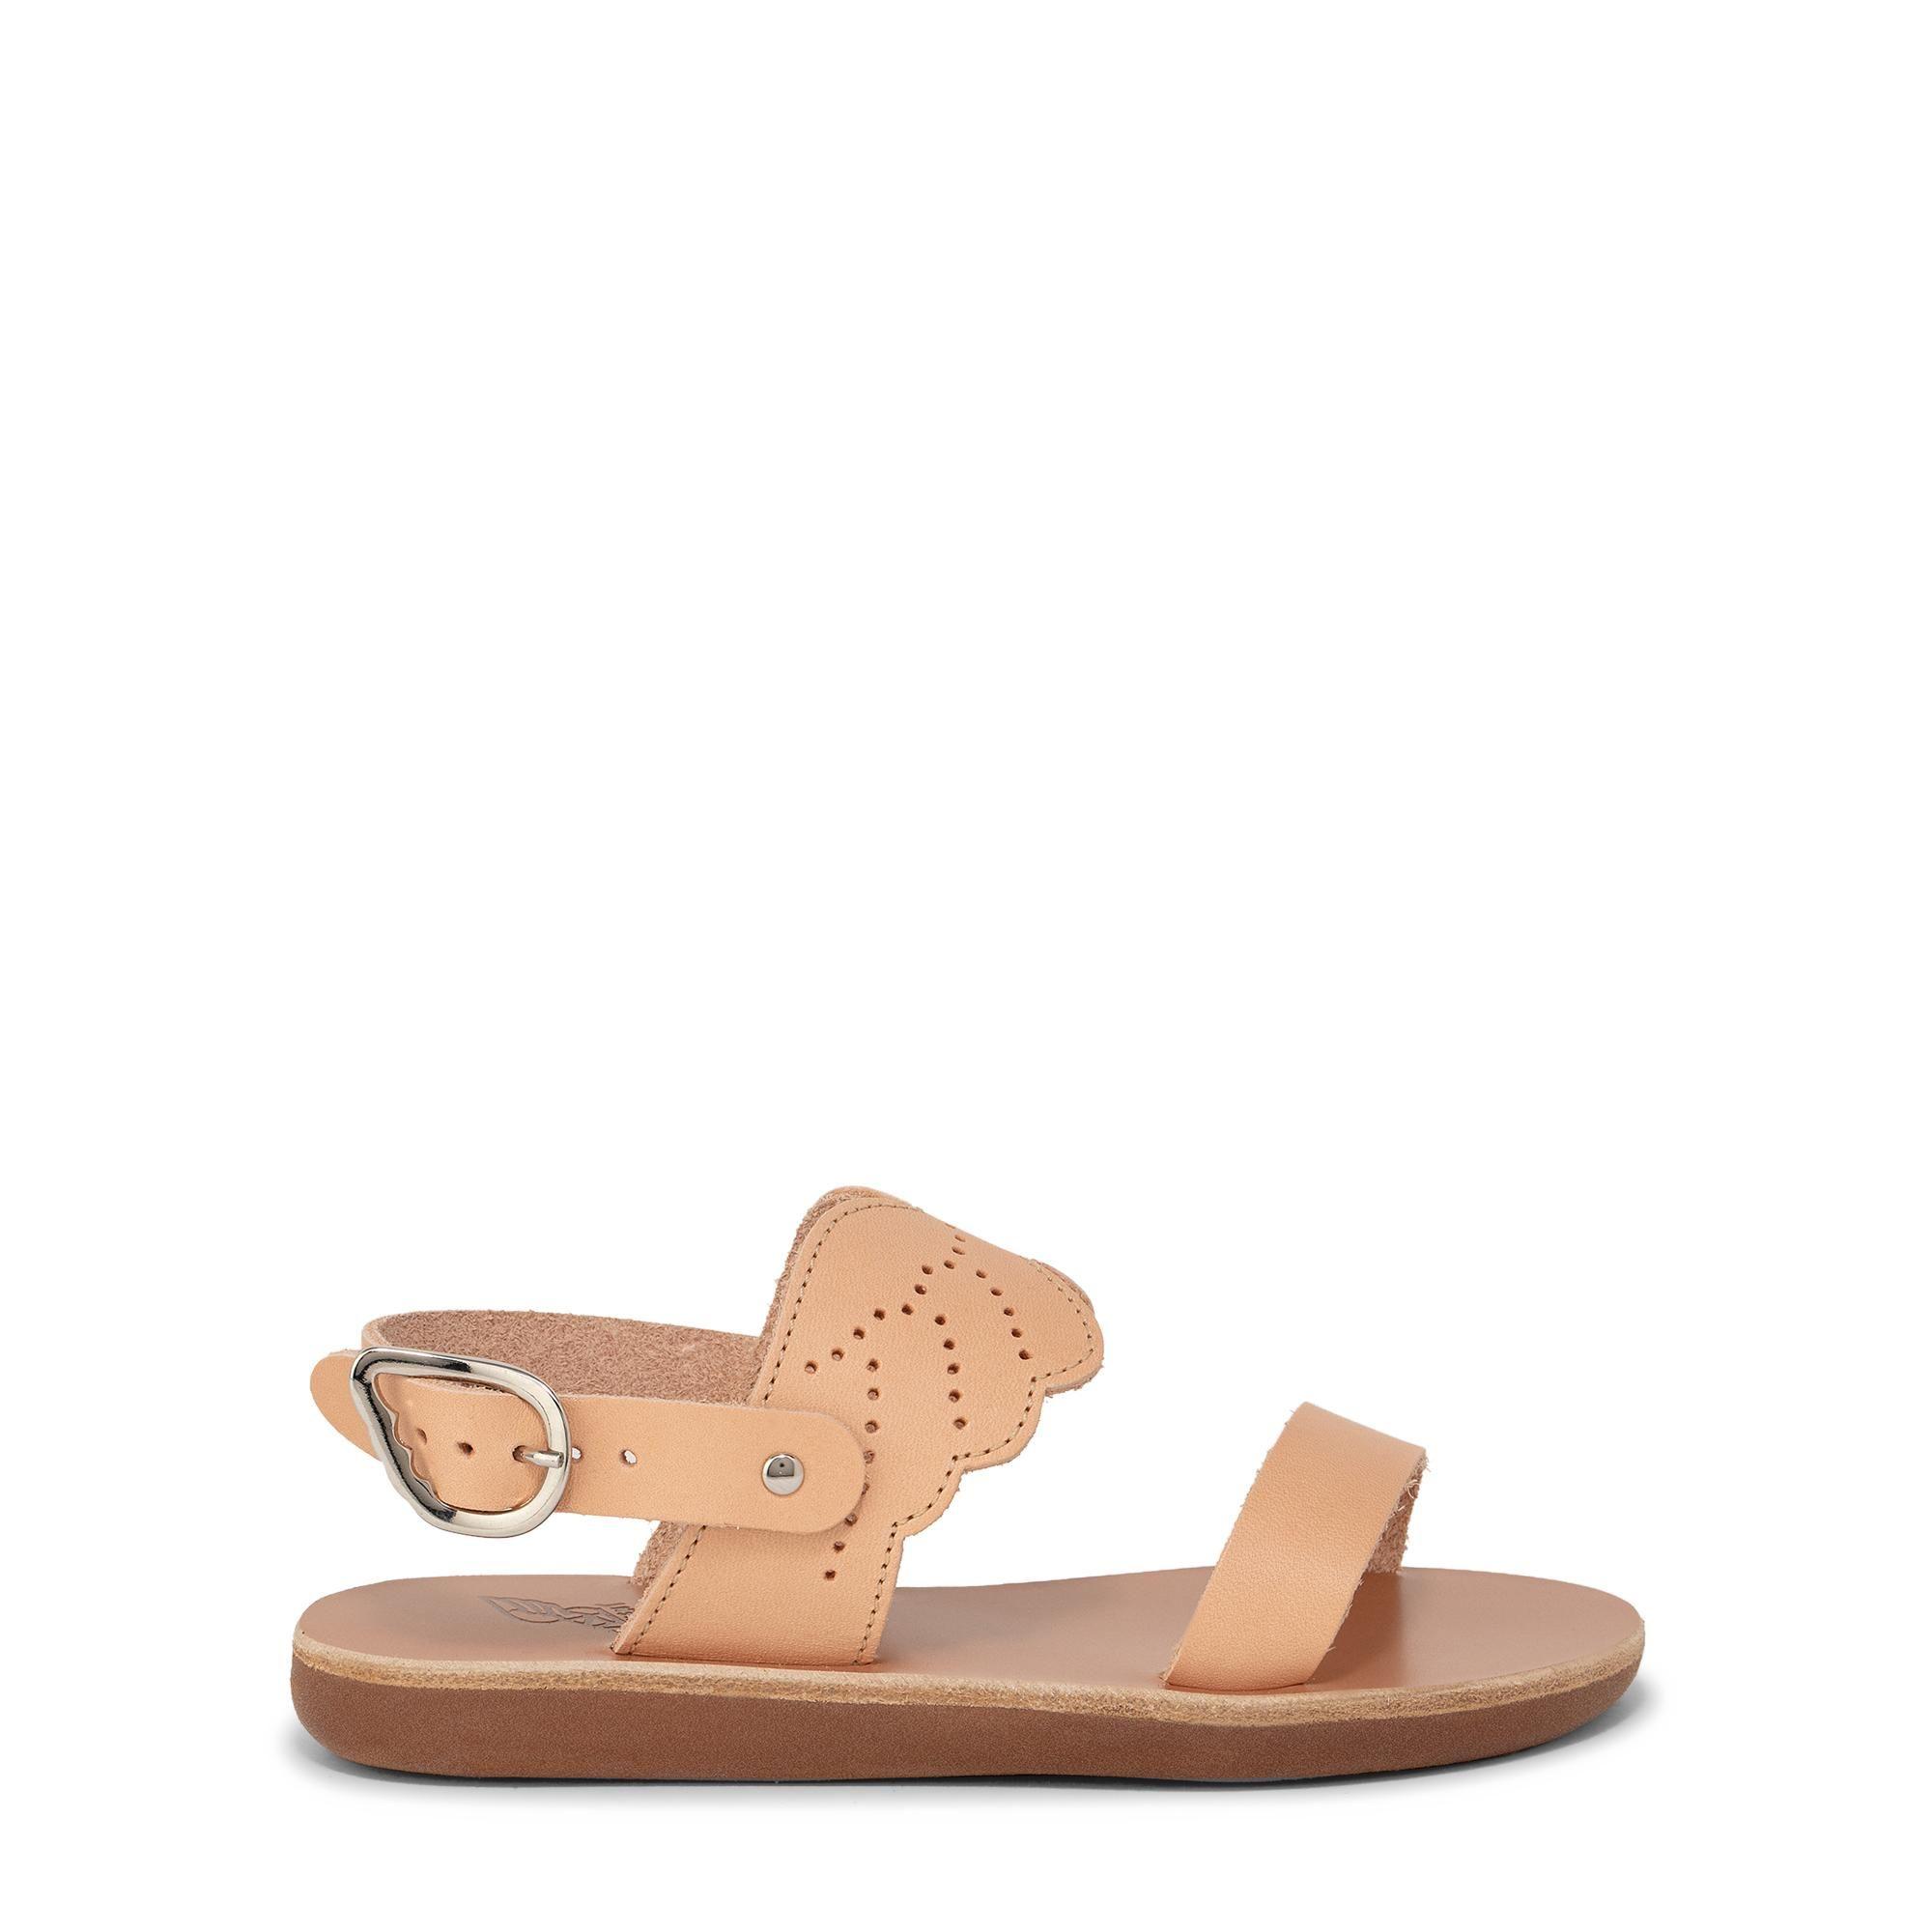 Little Odyssey sandals